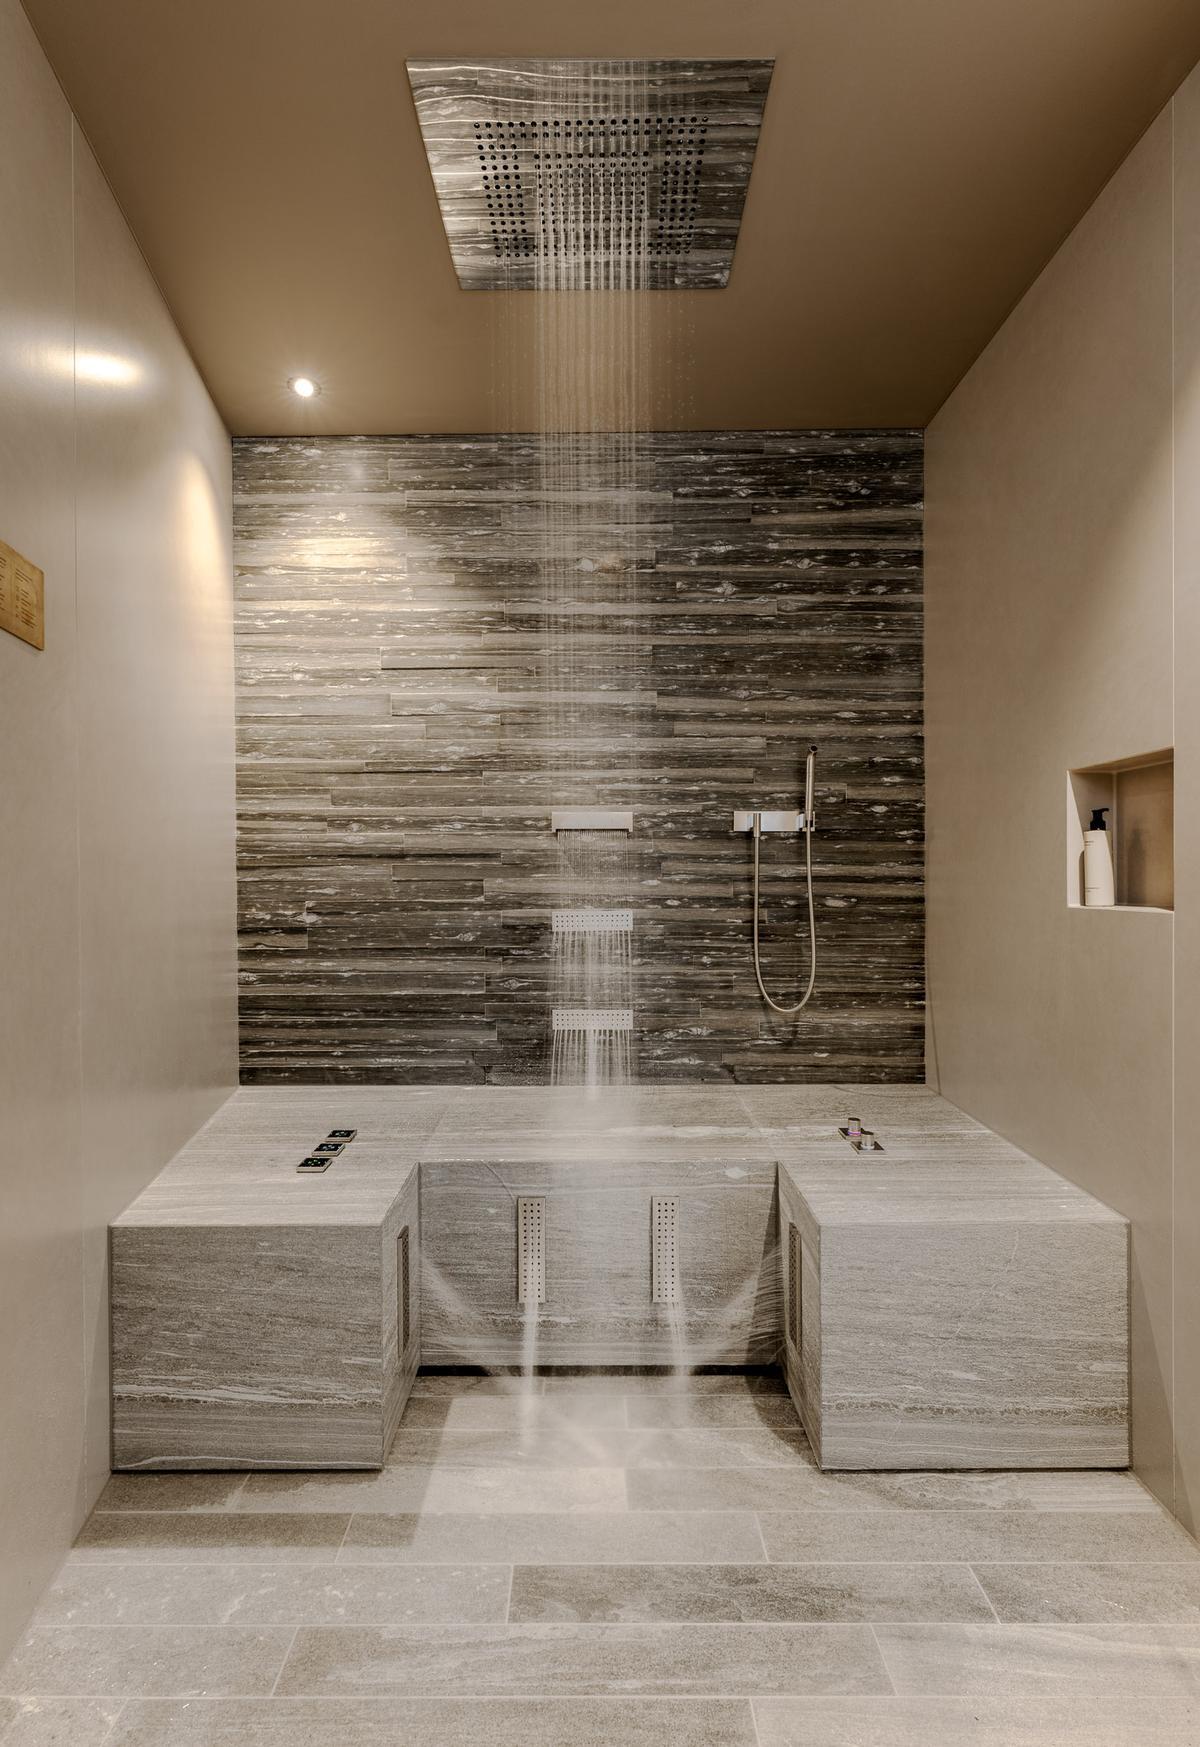 Dornbracht showers include a Horizontal Shower, Sensory Sky, Acquamoon, Comfort Shower, Foot Bath and Leg Shower